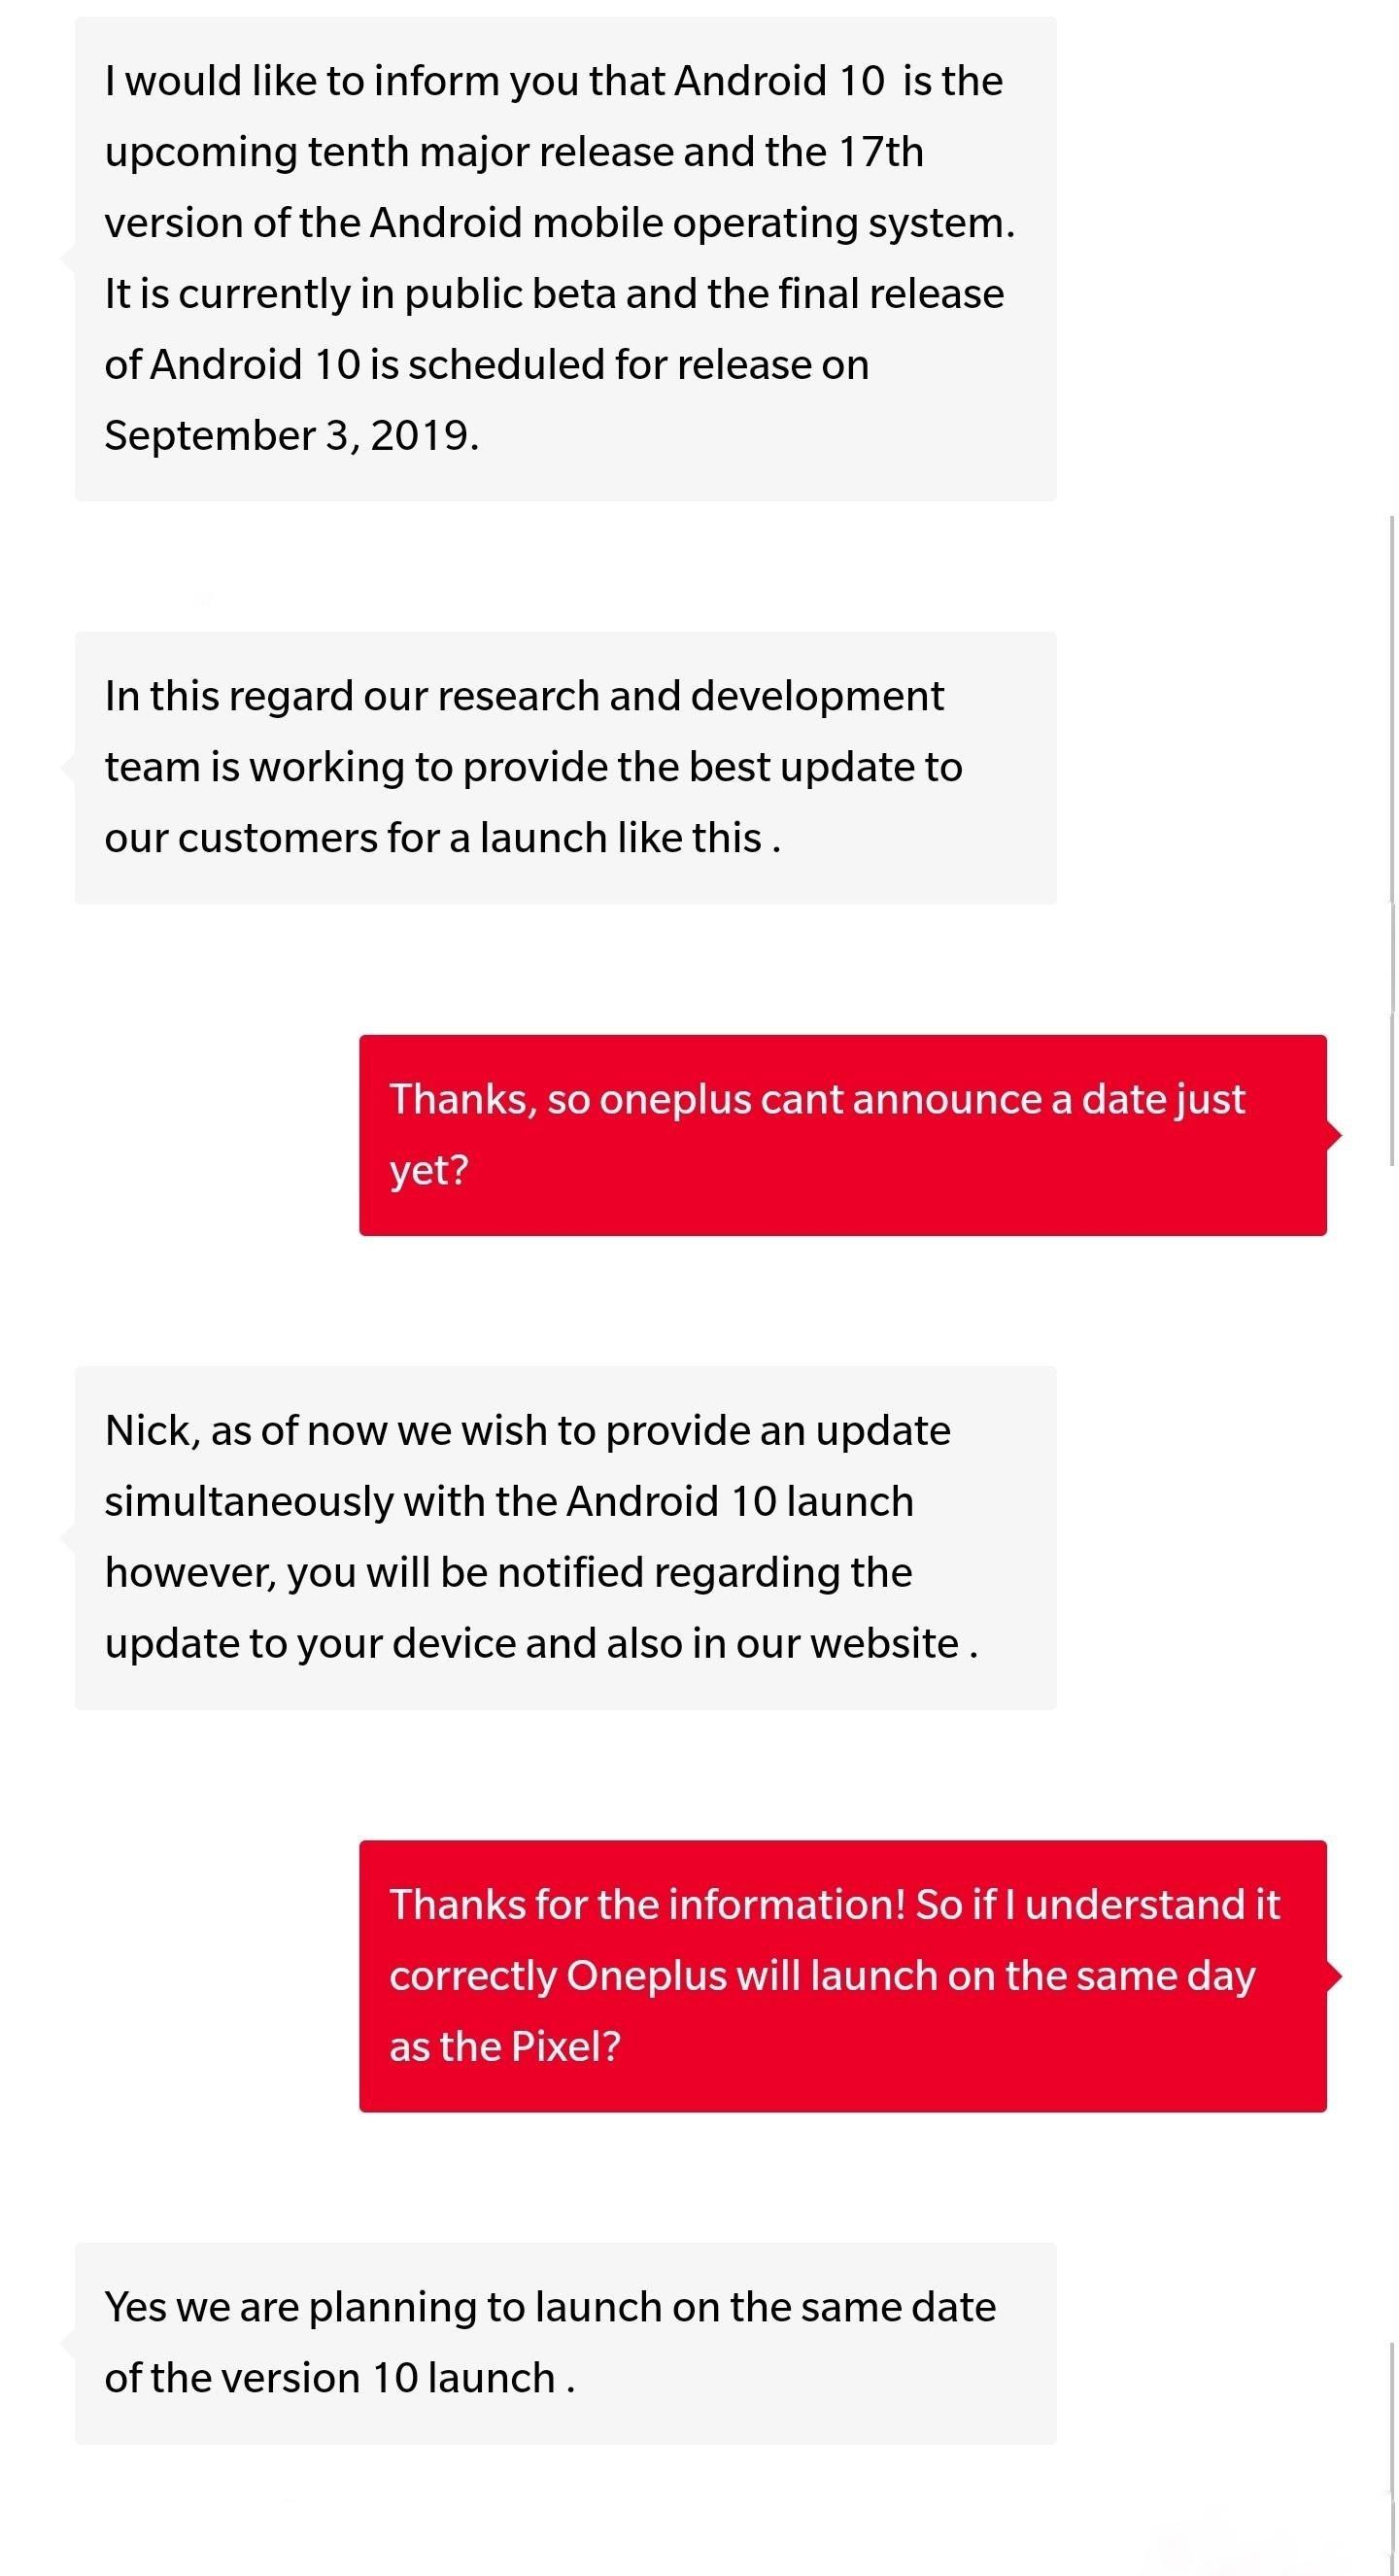 conversa reddit OnePlus